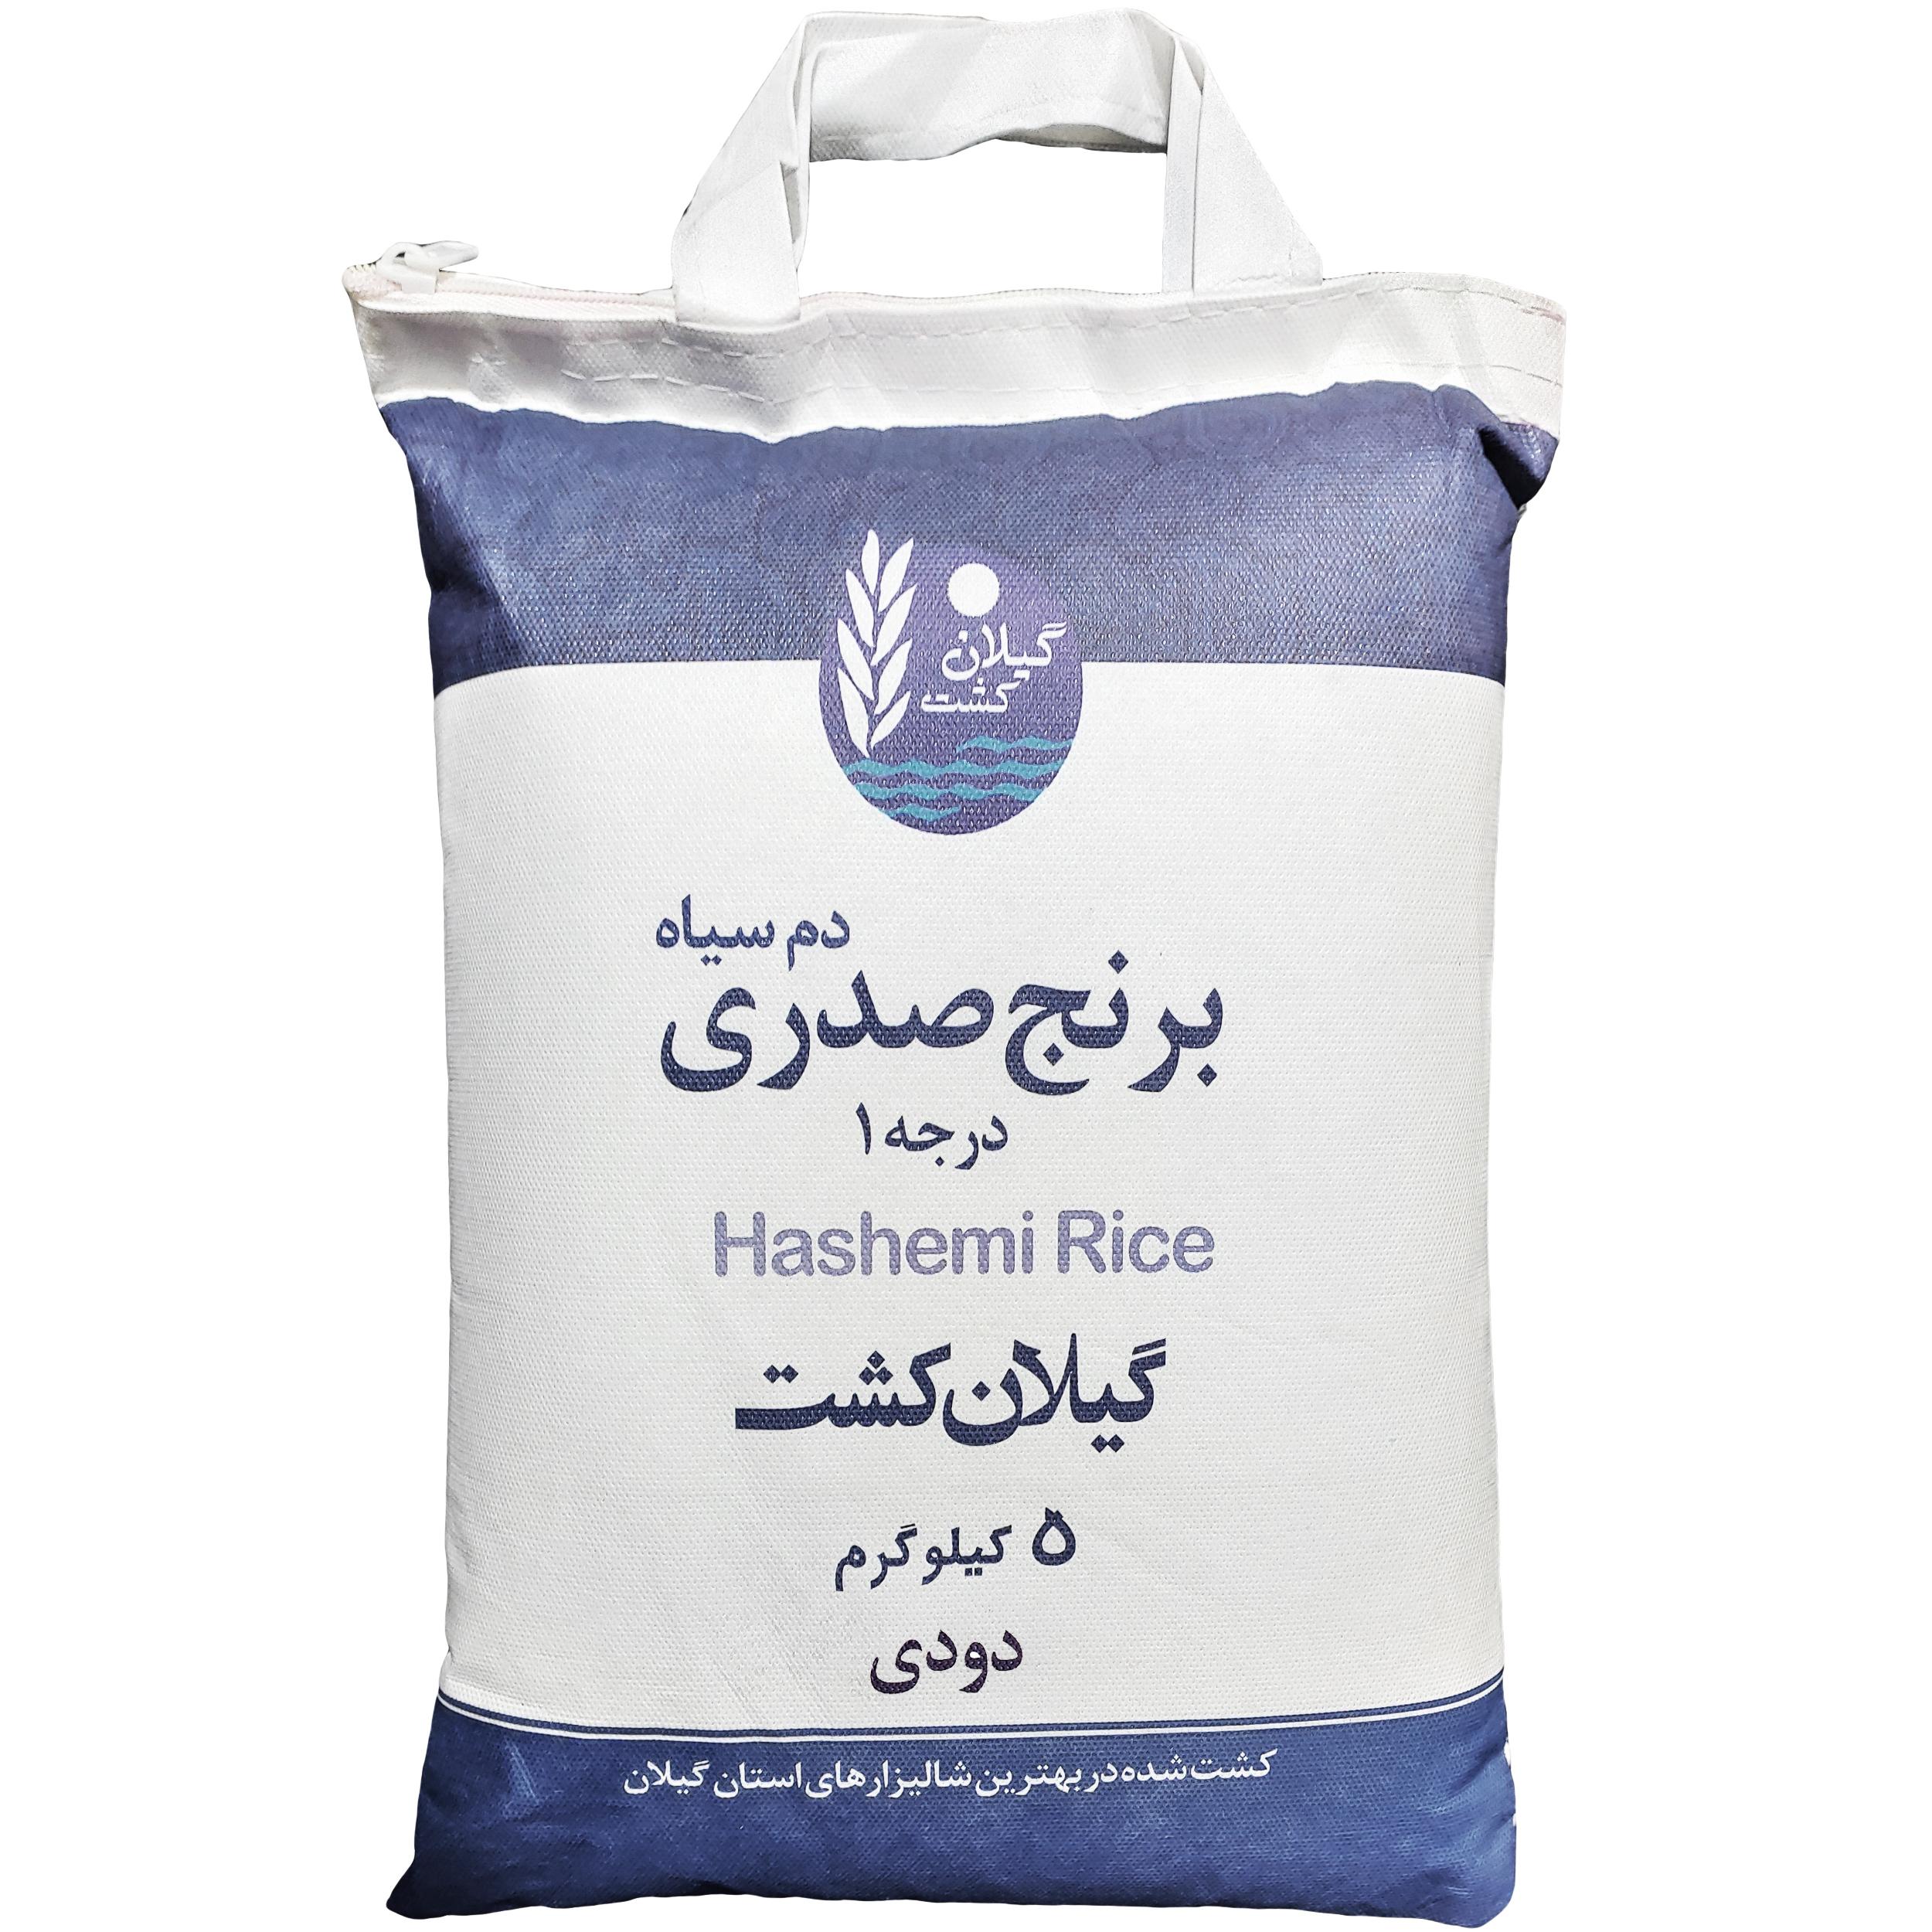 برنج صدری دم سیاه دودی گیلان کشت - 5 کیلوگرم